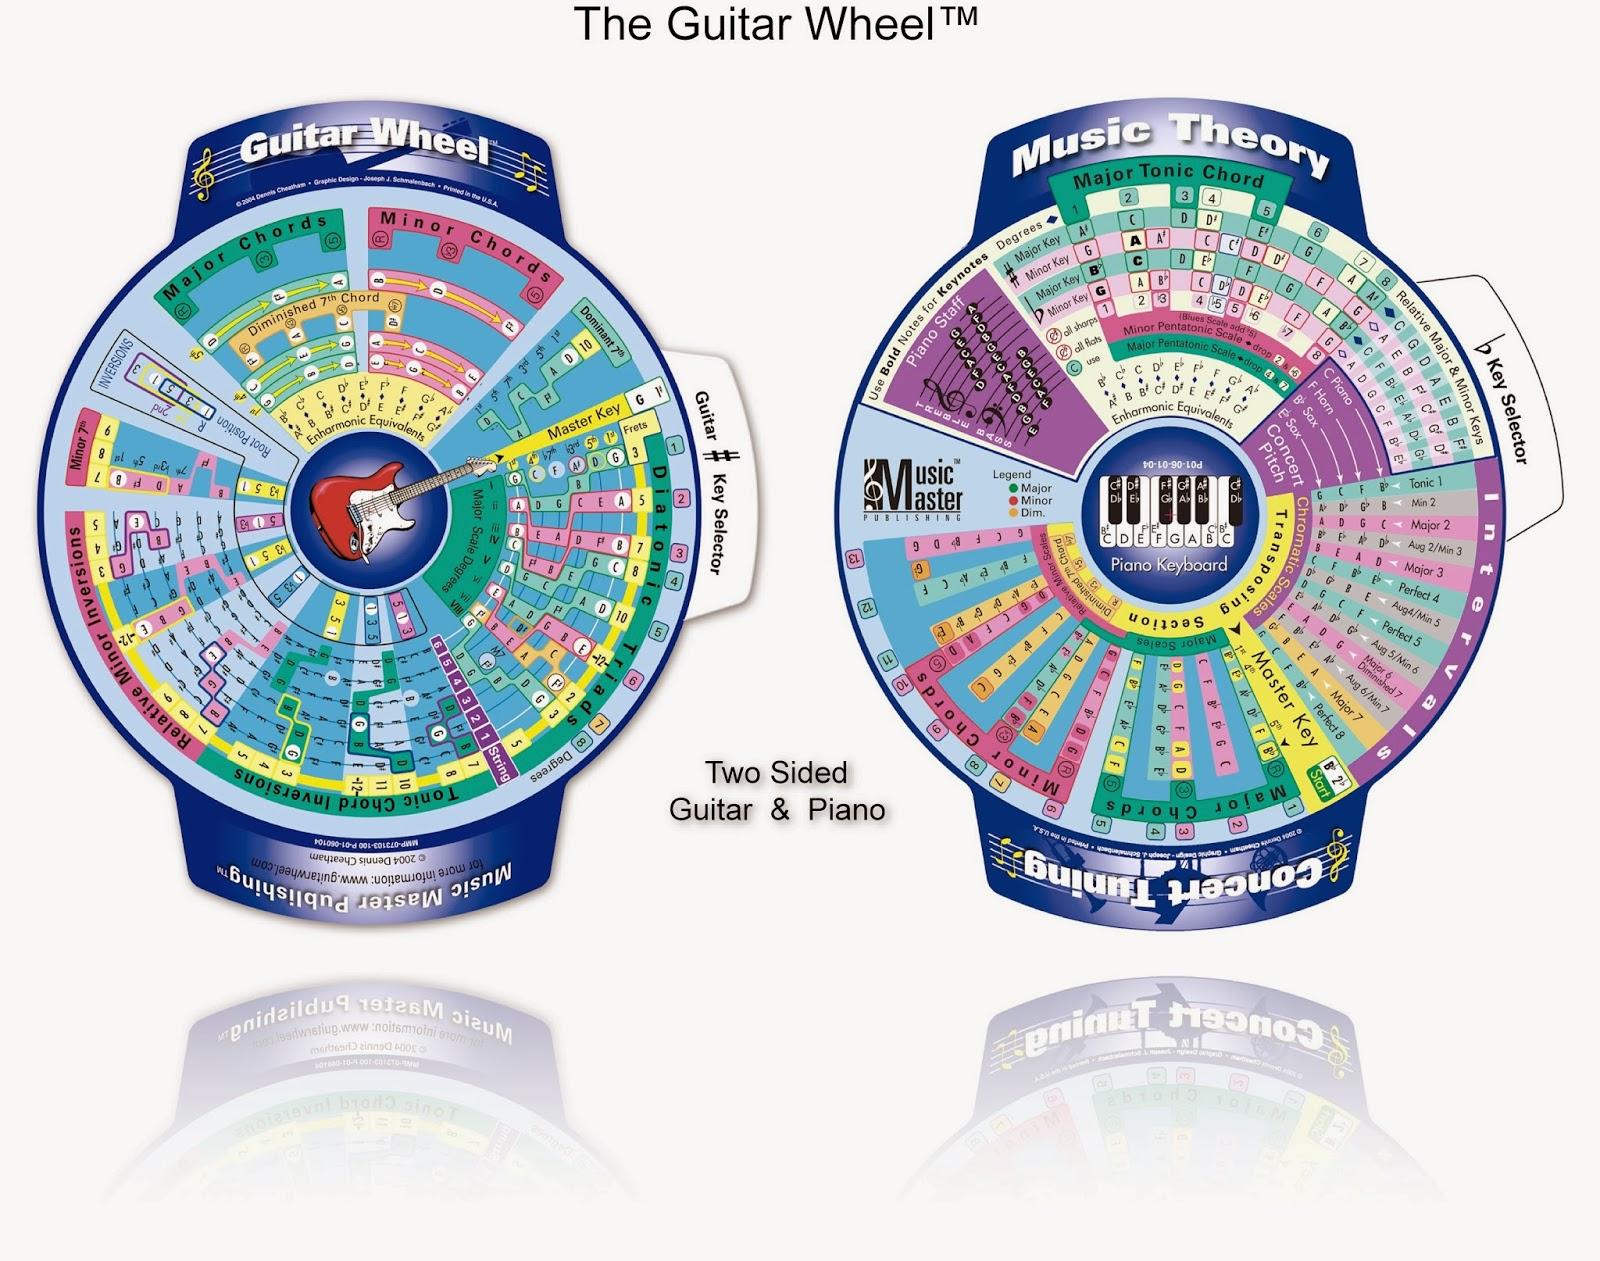 The Guitar Teaching Blog Educational Material Review The Guitar Wheel